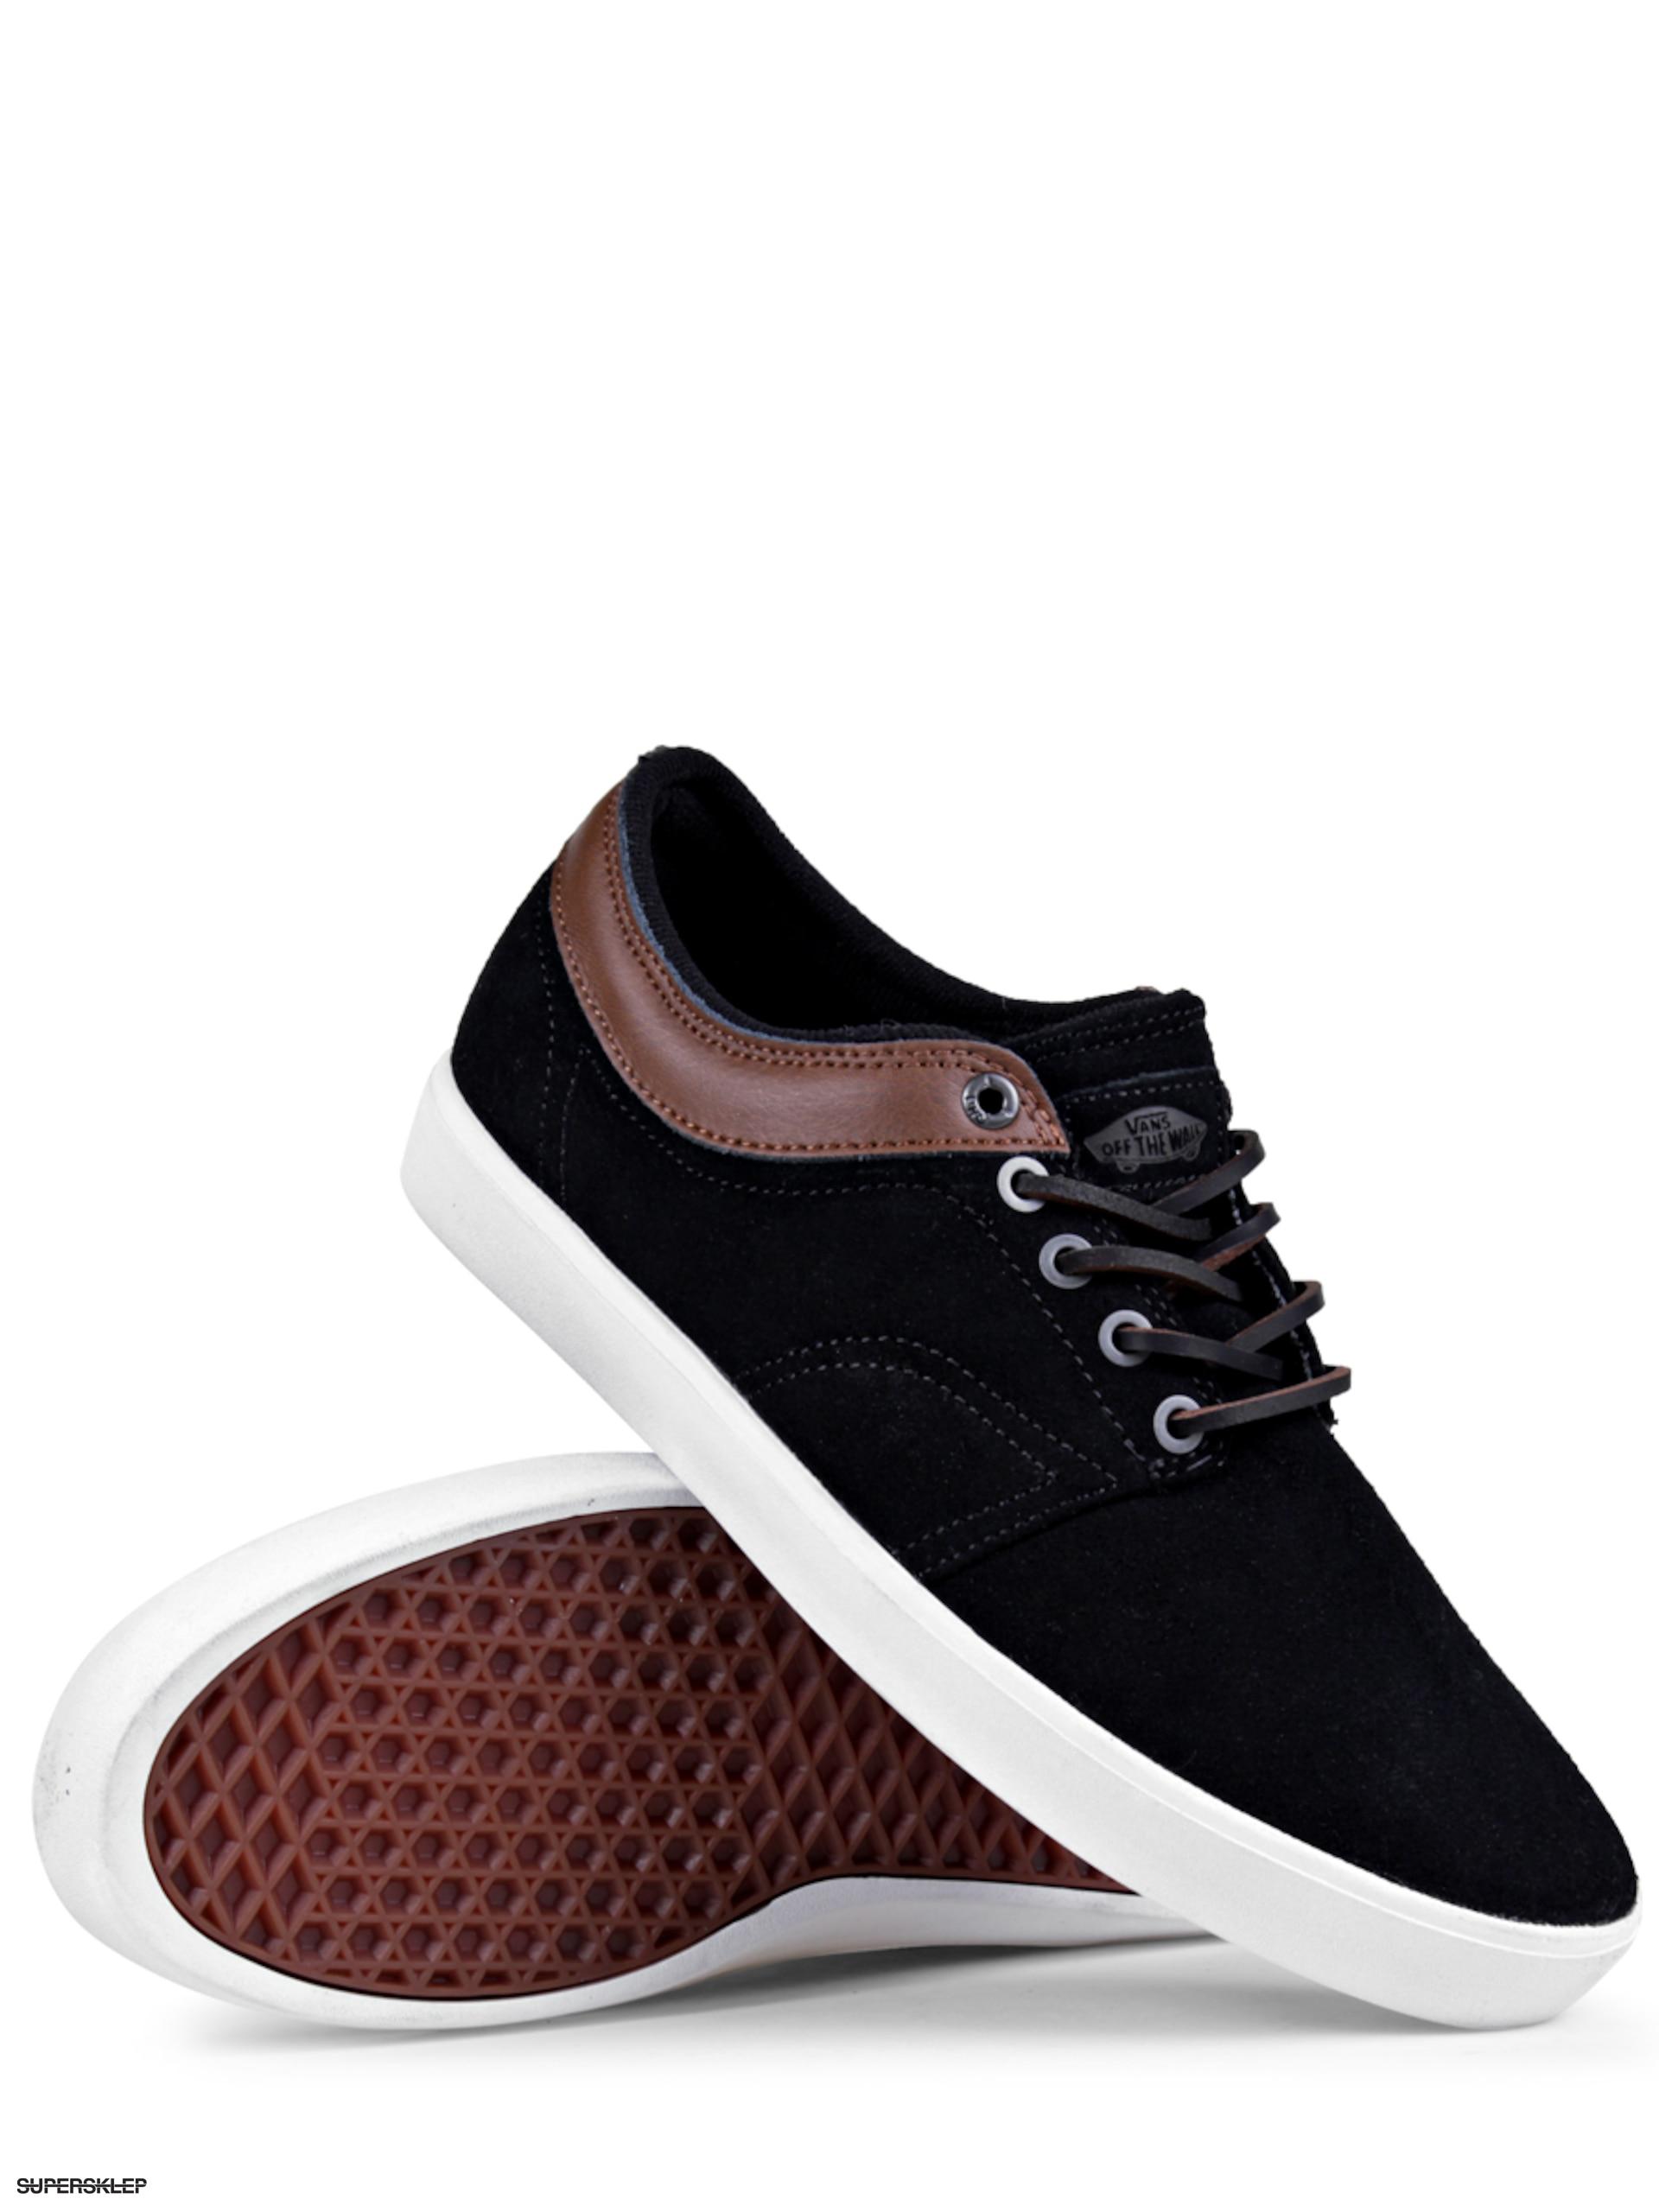 97dfc54122 Boty Vans Pacquard (black brown white)